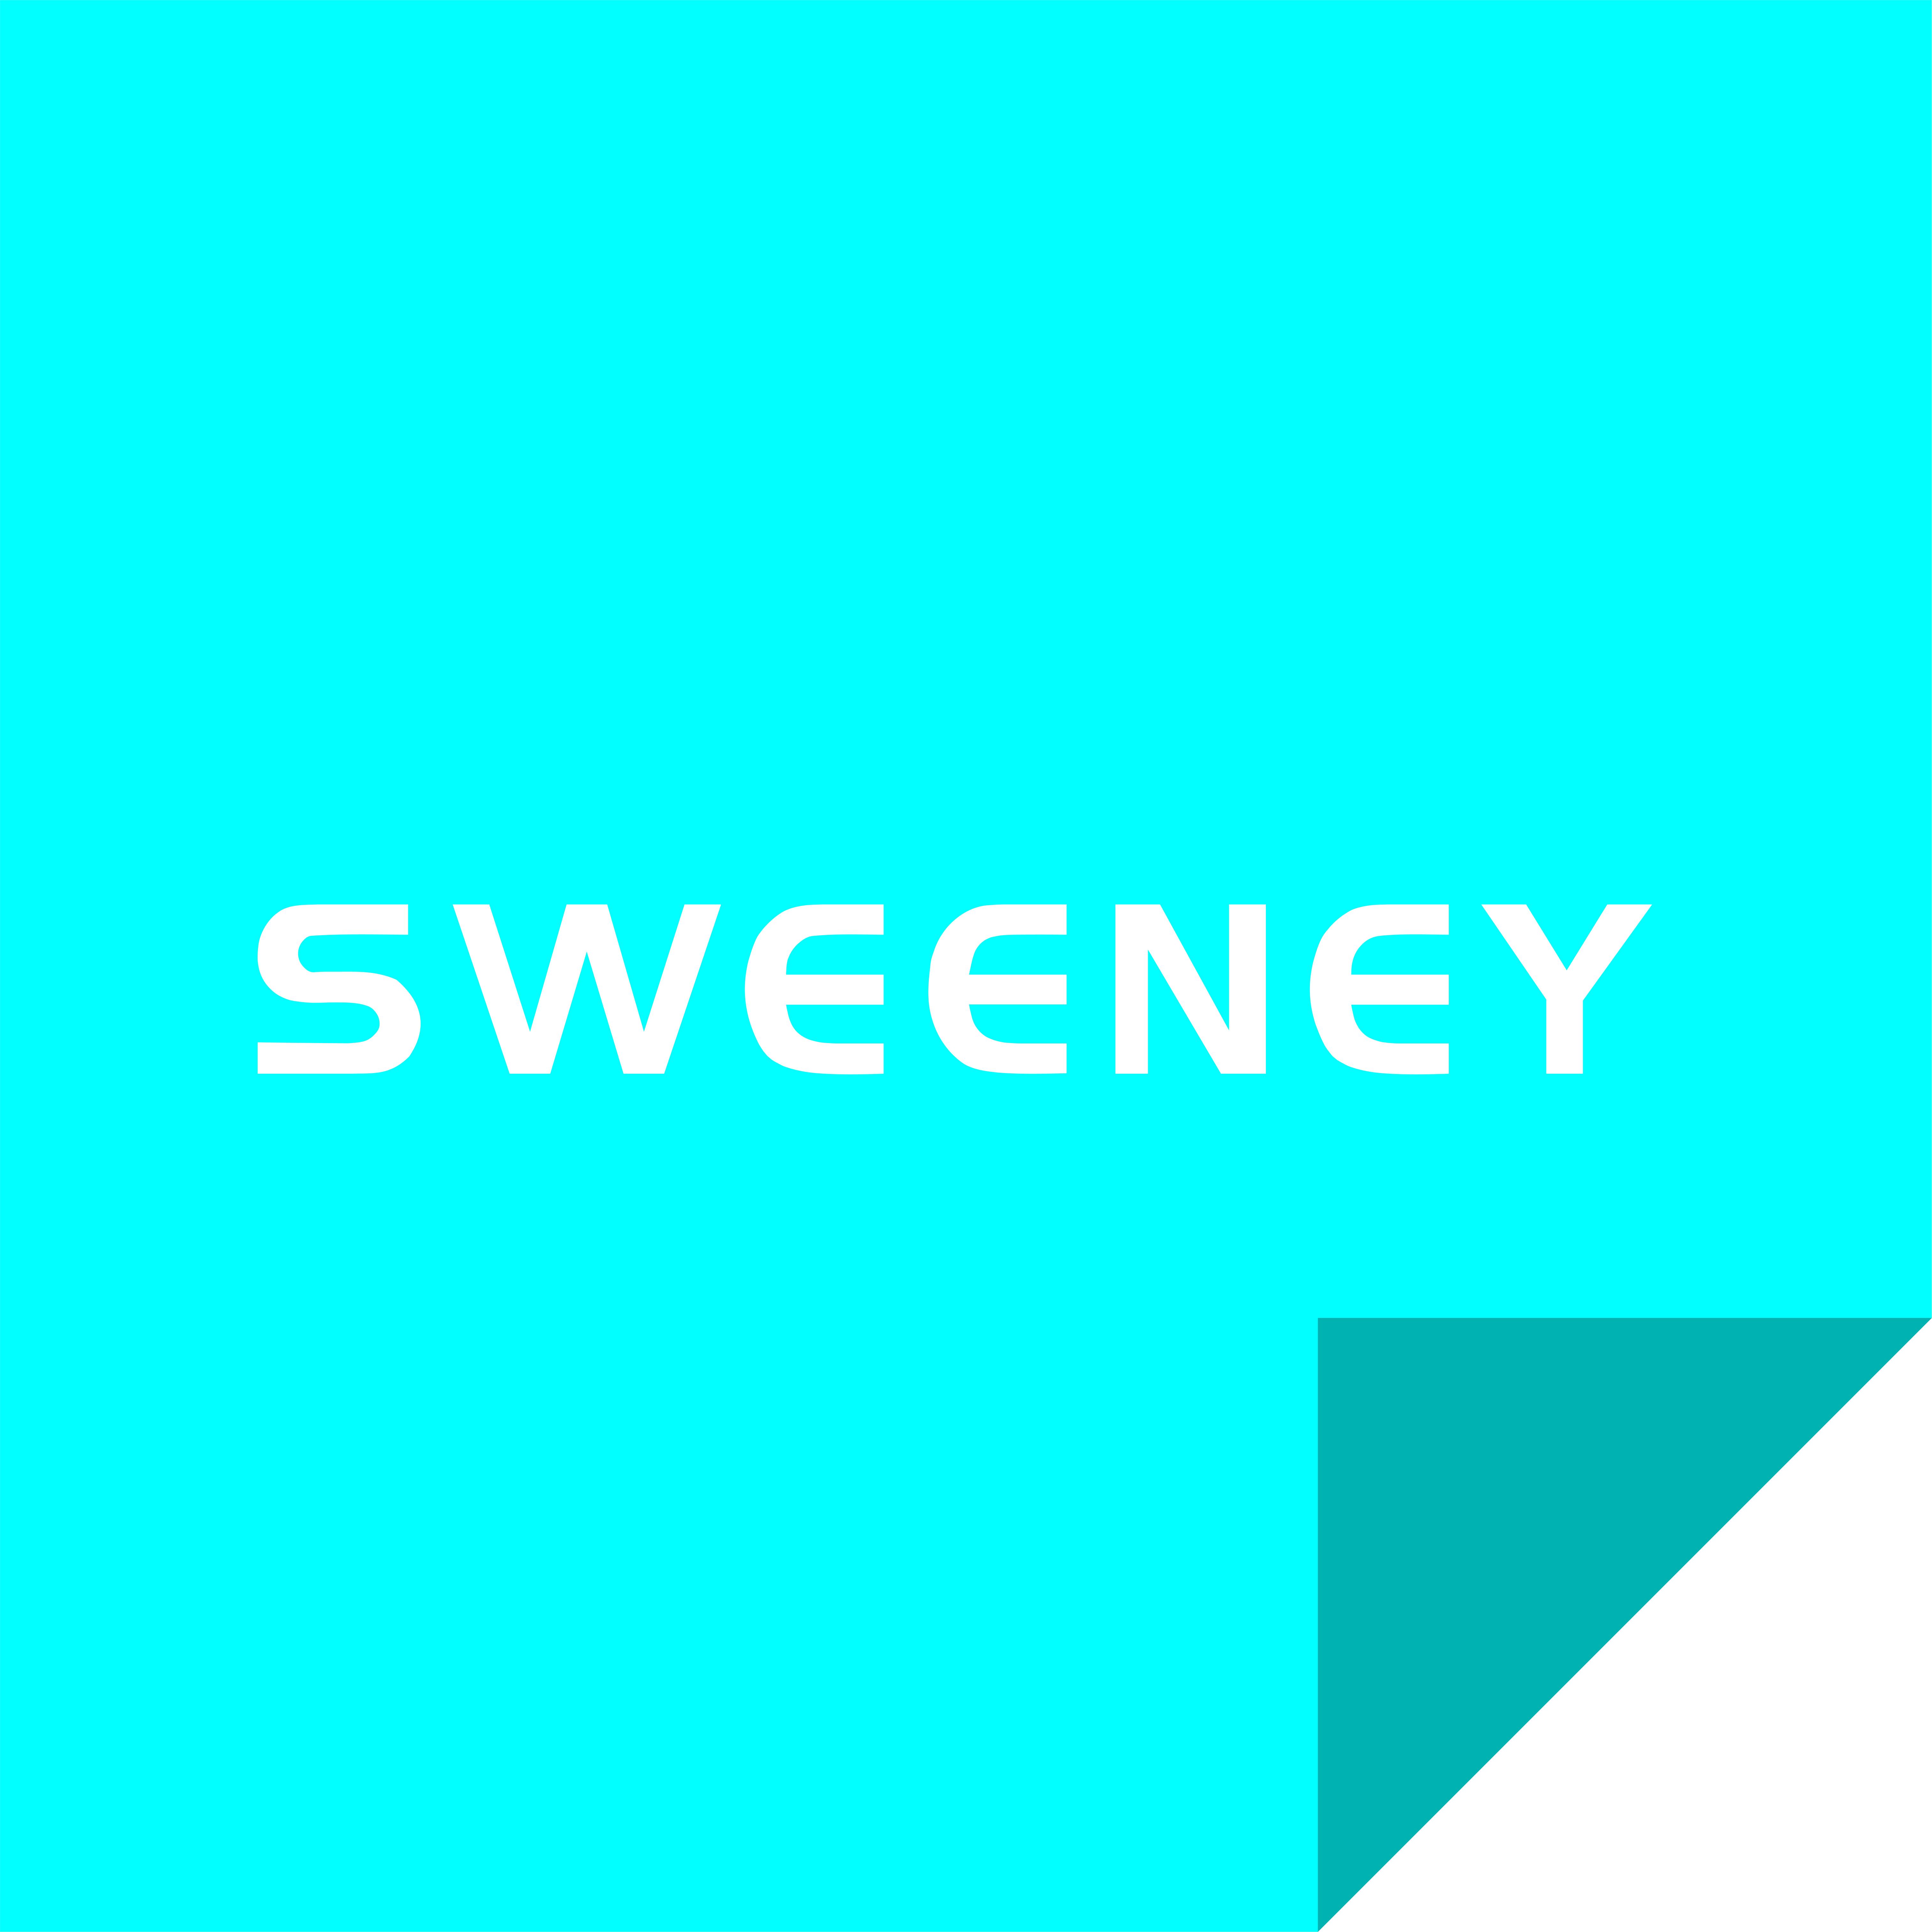 Sandy Sweeney